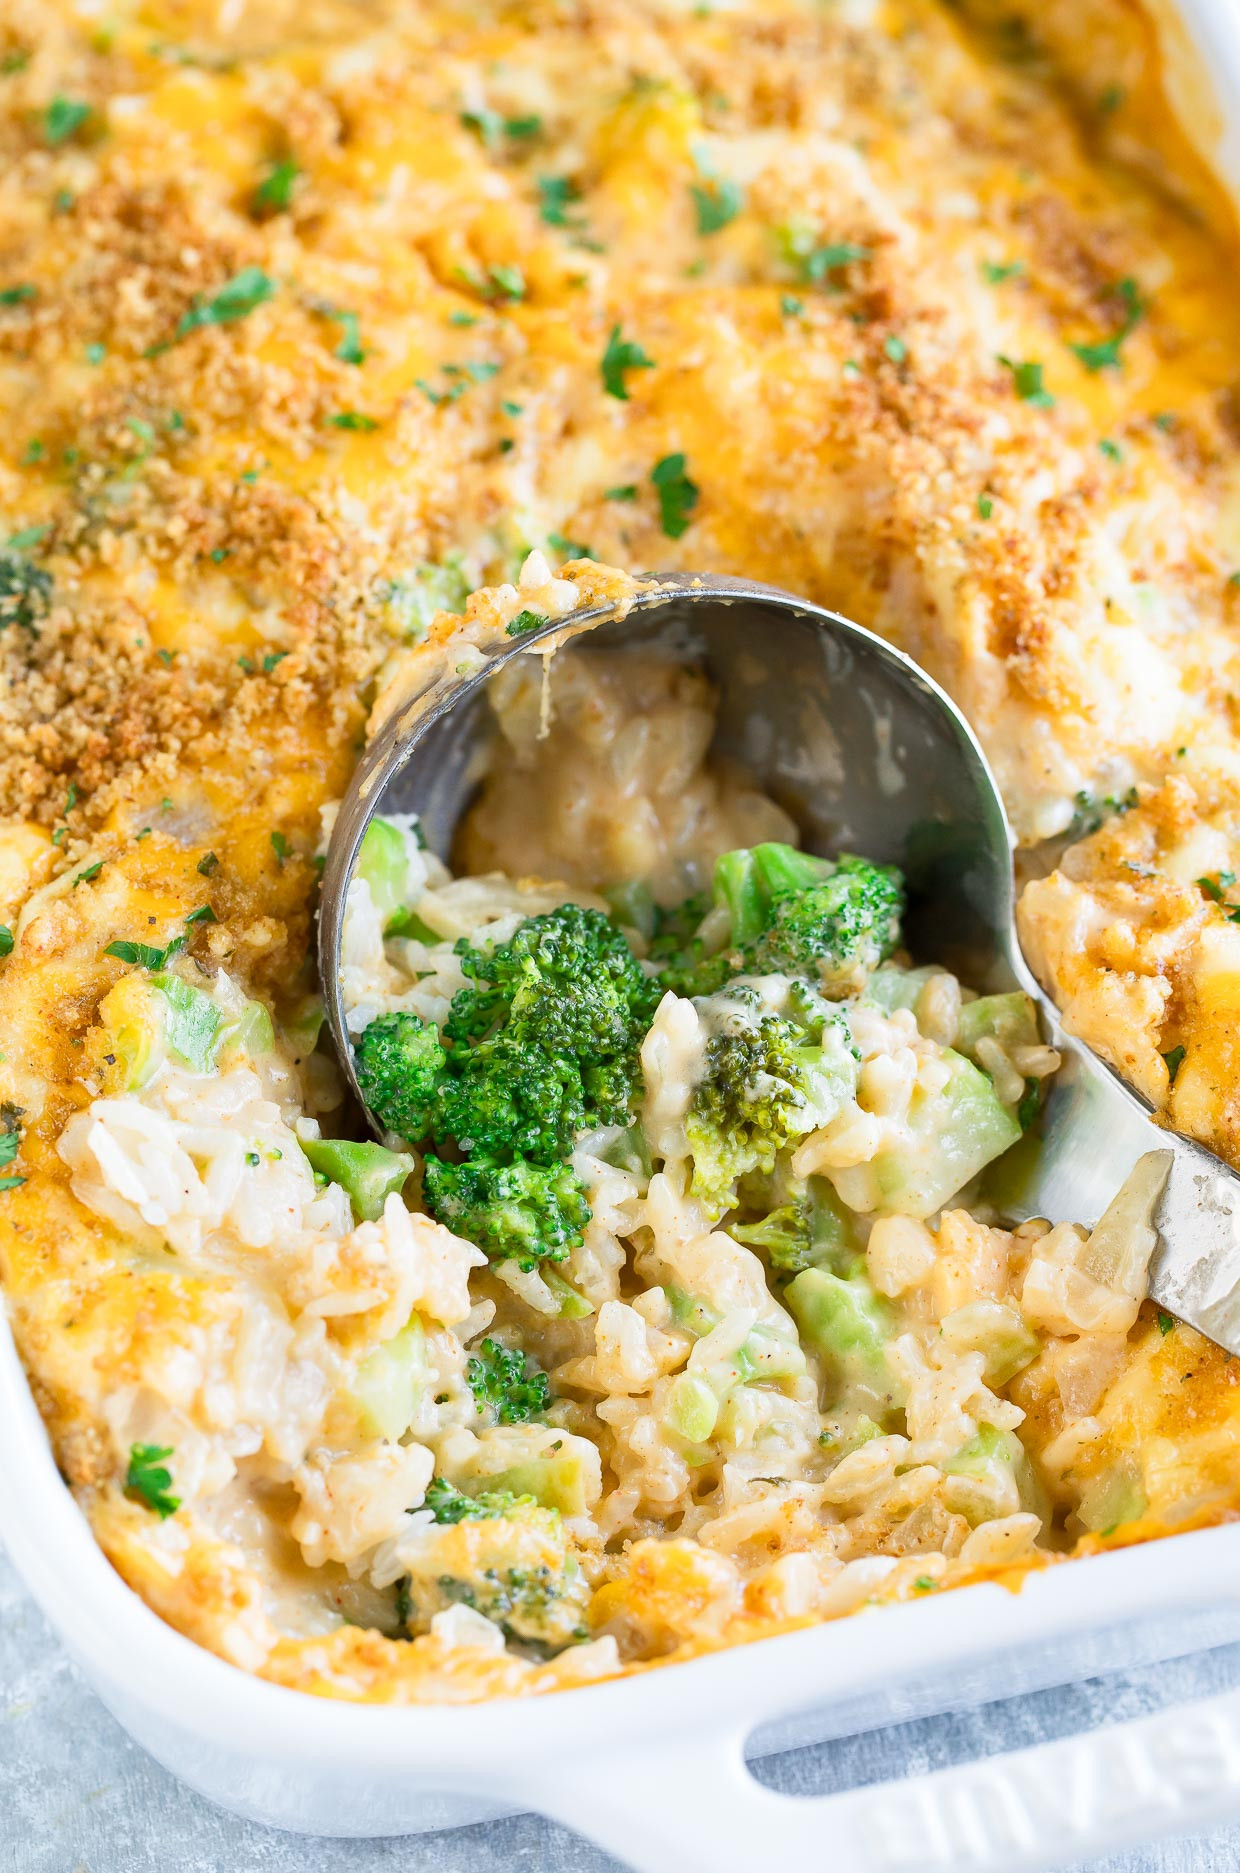 Easy Broccoli Rice Casserole  Cheesy Broccoli Rice Casserole We Love this Ve arian